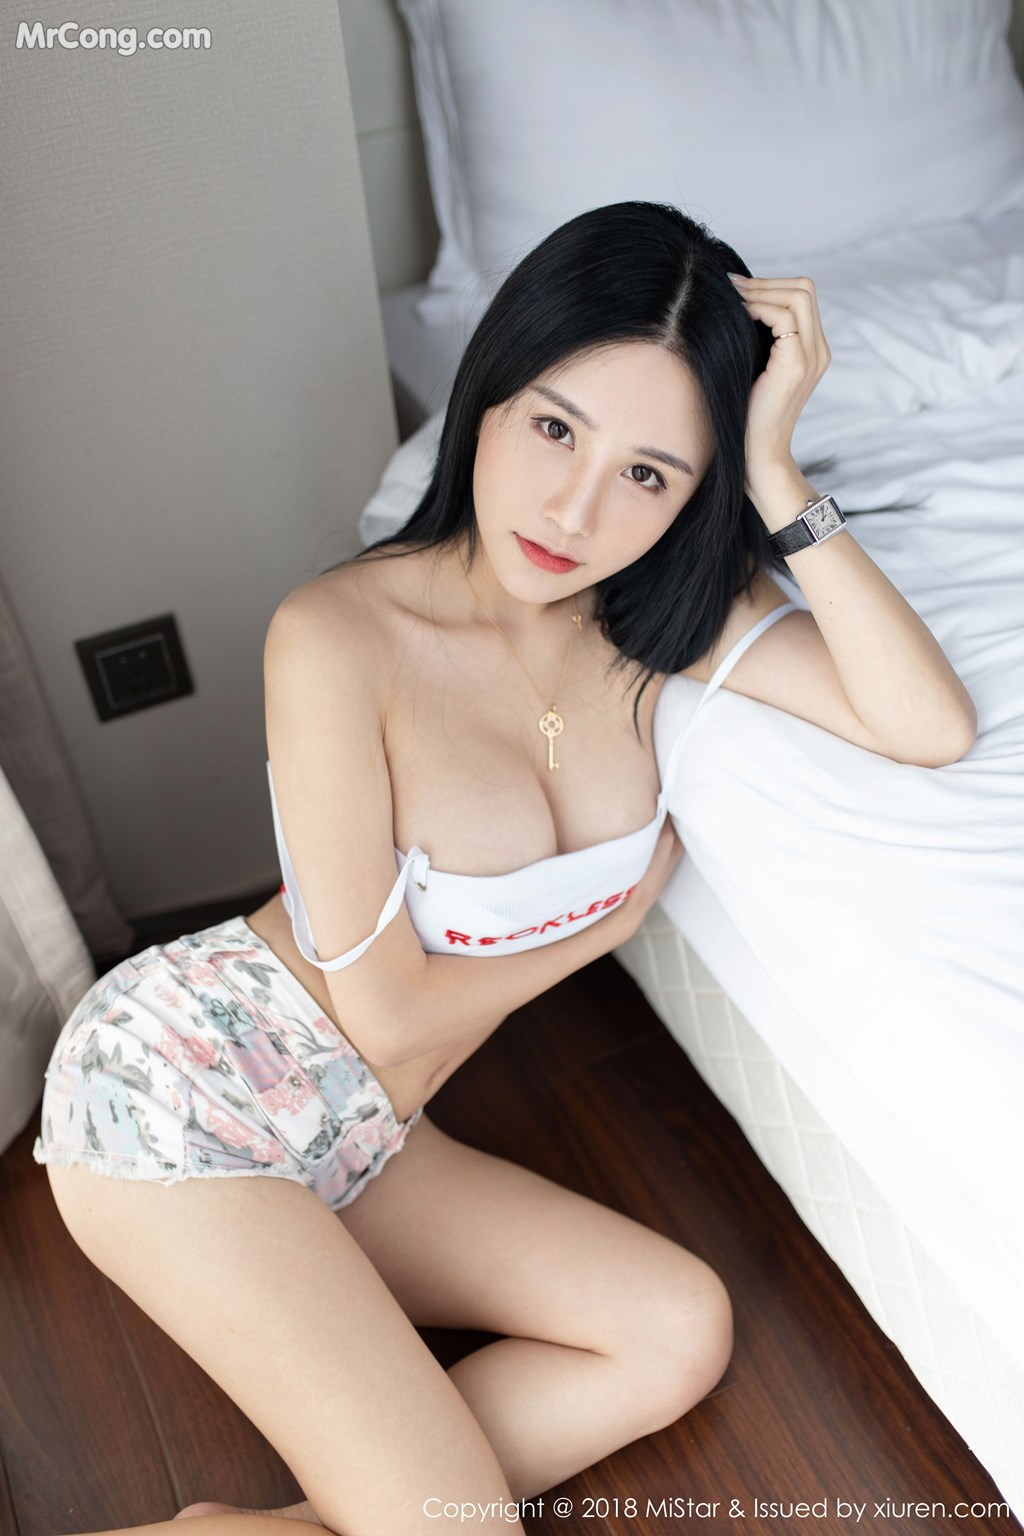 Image MiStar-Vol.248-Xiao-Mo-Lin-MrCong.com-039 in post MiStar Vol.248: Người mẫu Xiao Mo Lin (小沫琳) (44 ảnh)